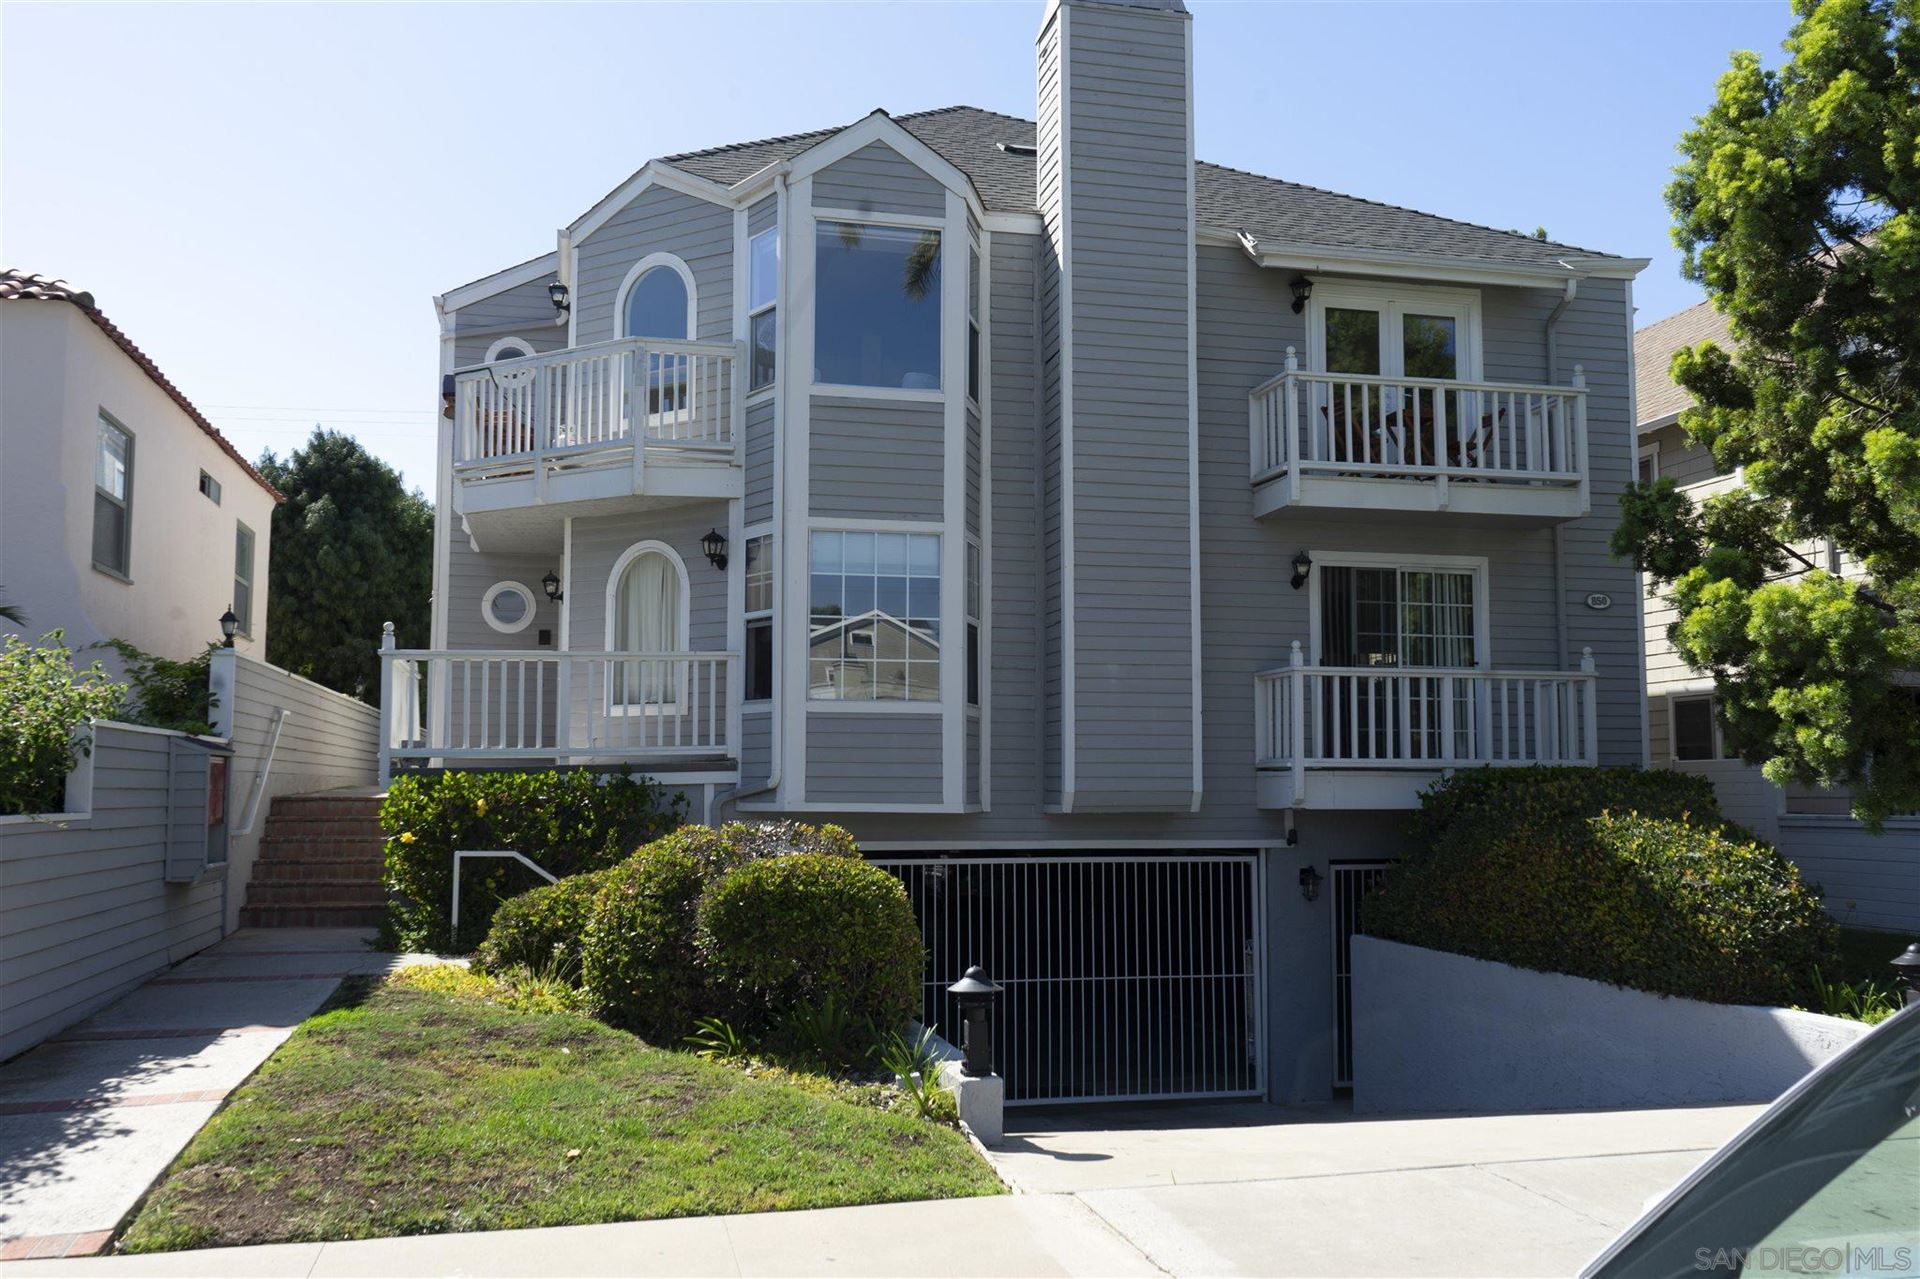 Photo of 850 C Avenue #3, Coronado, CA 92118 (MLS # 210021335)